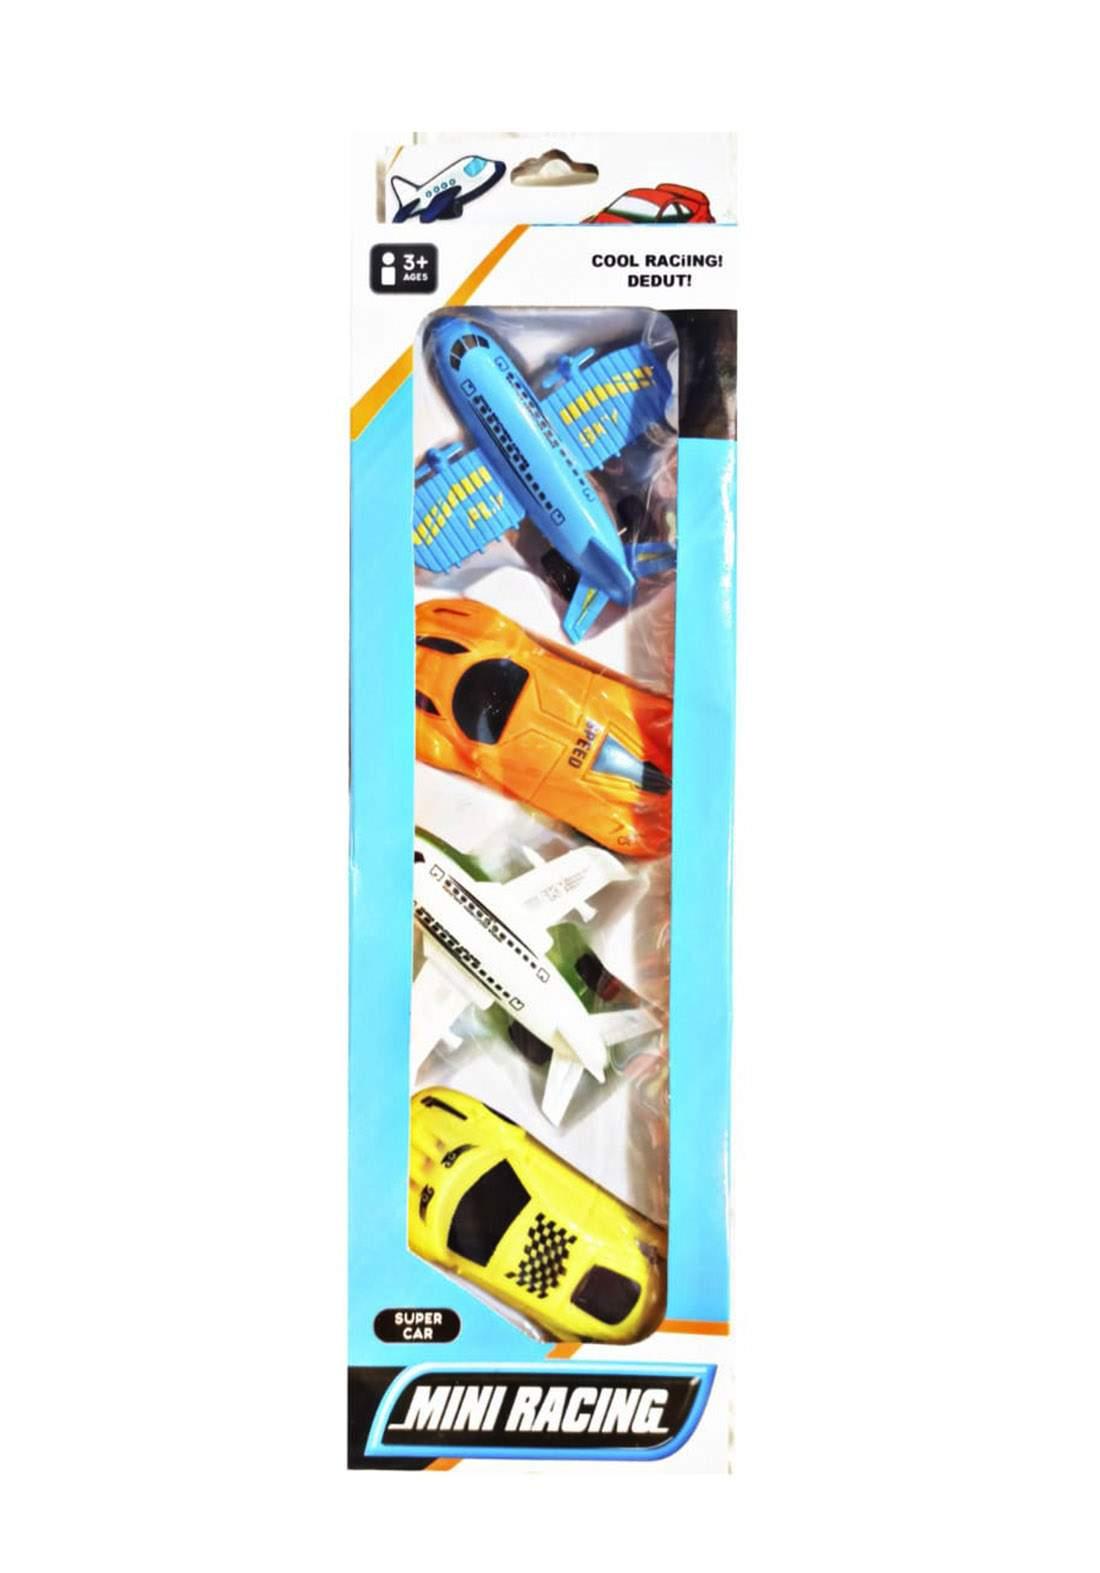 Super Car Mini Racing Toy  Toy for Kids سيت لعبة للأطفال